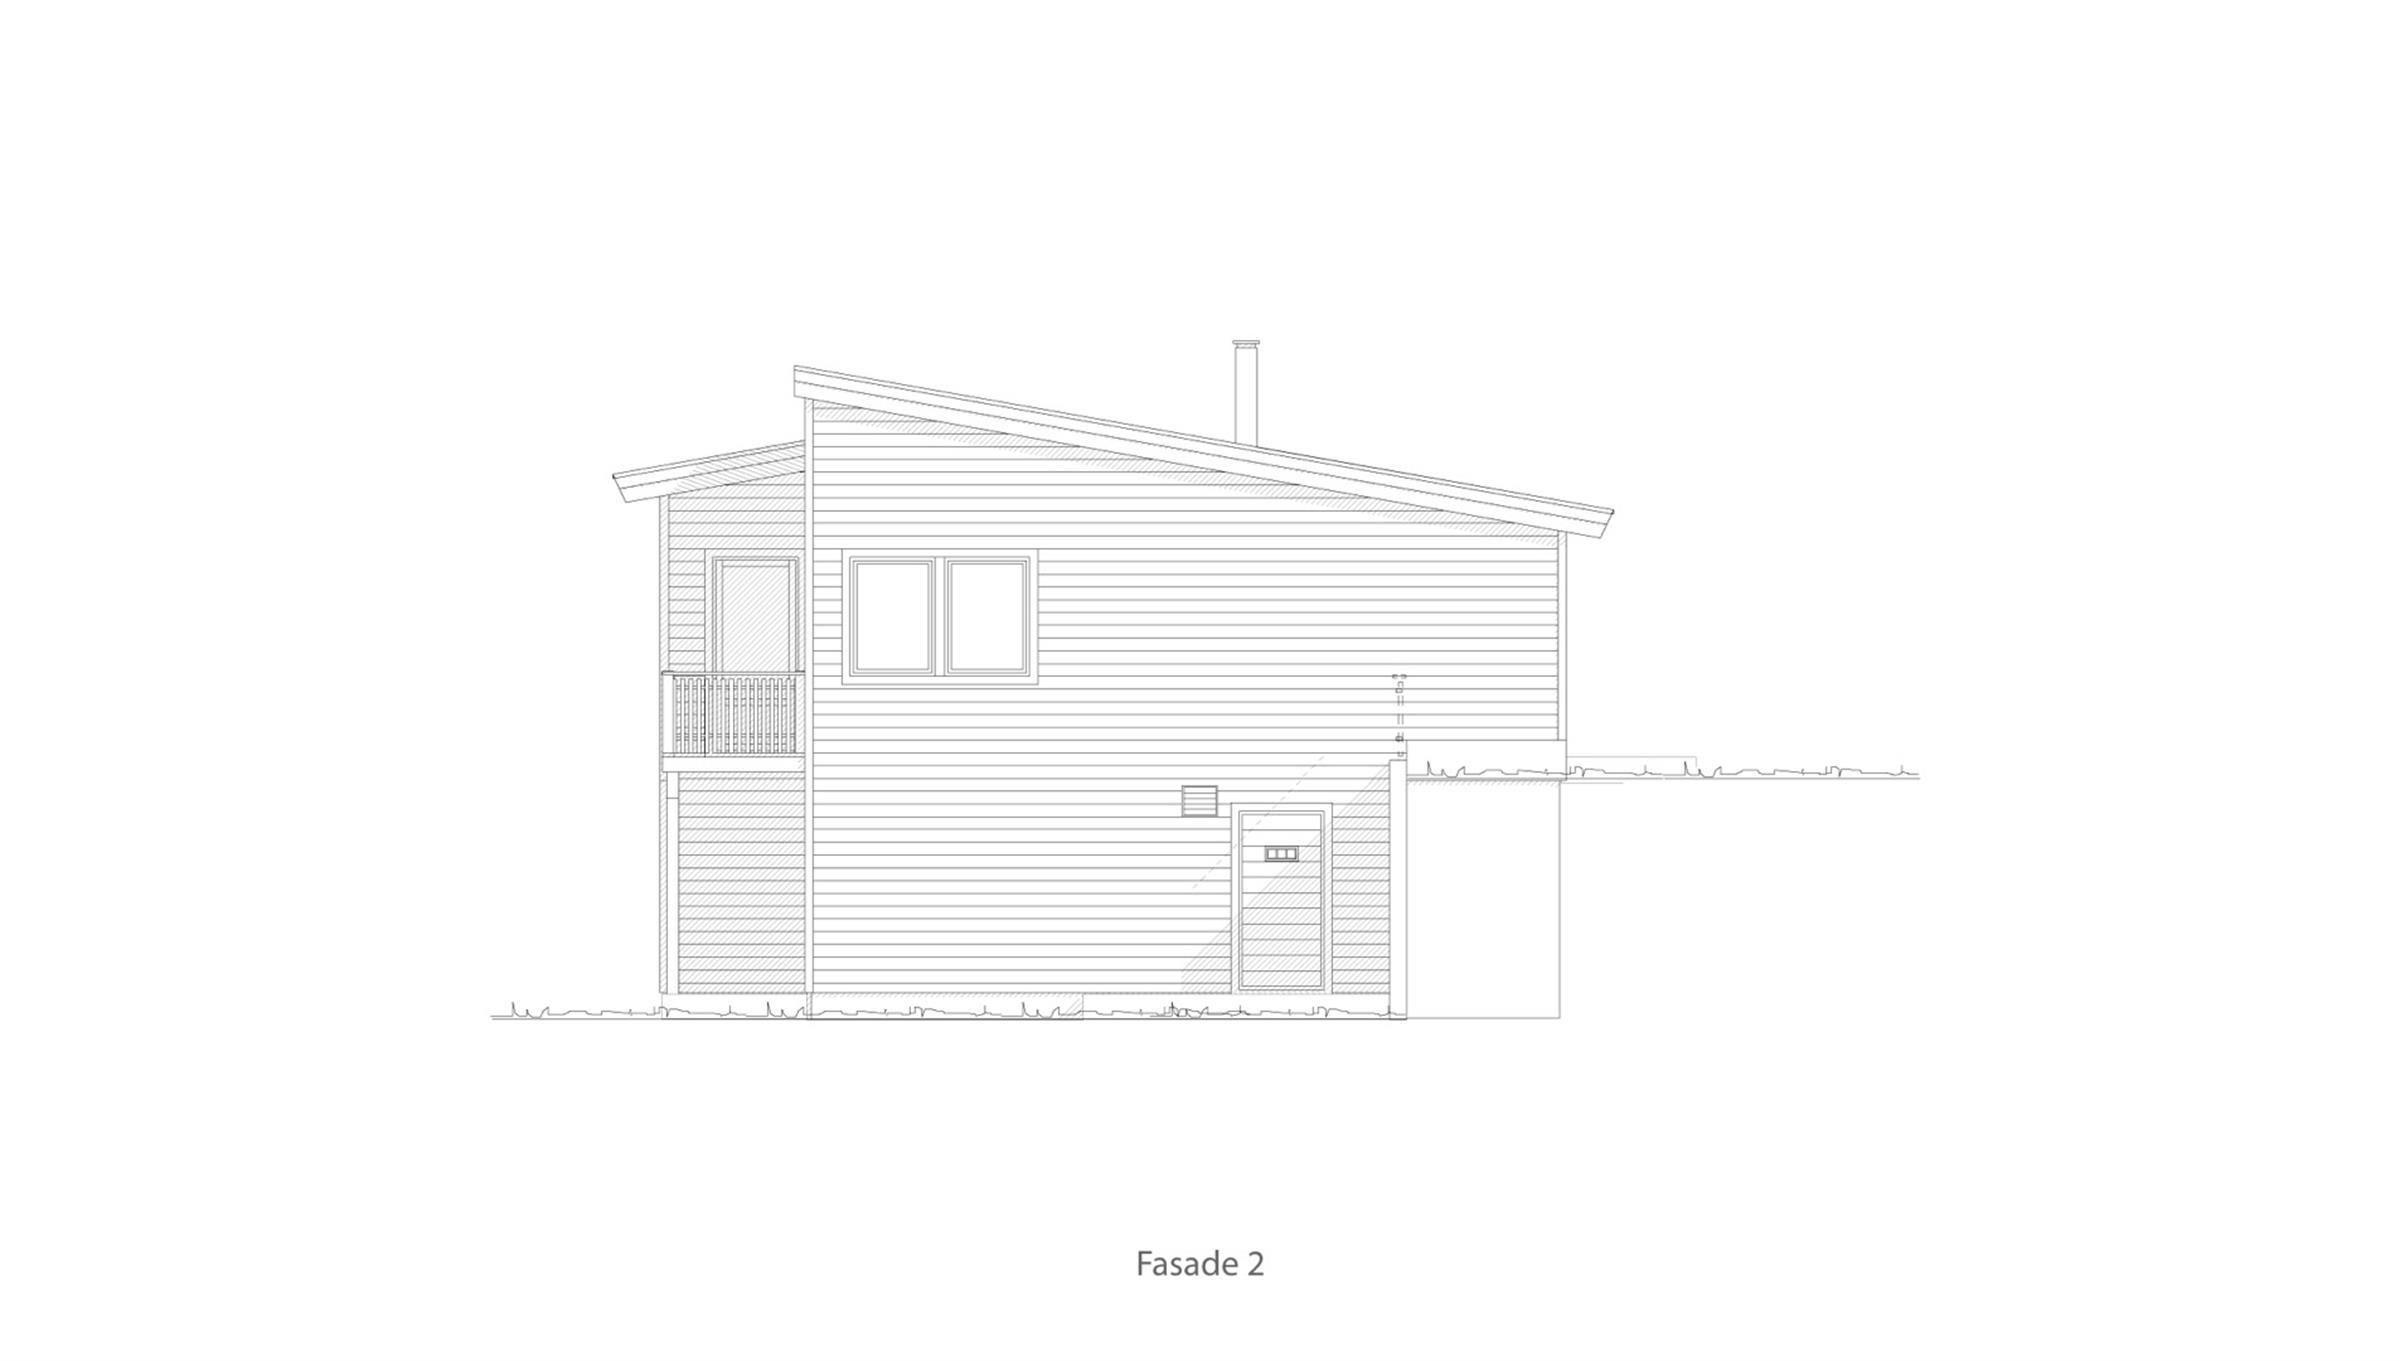 Bryne fasade 2